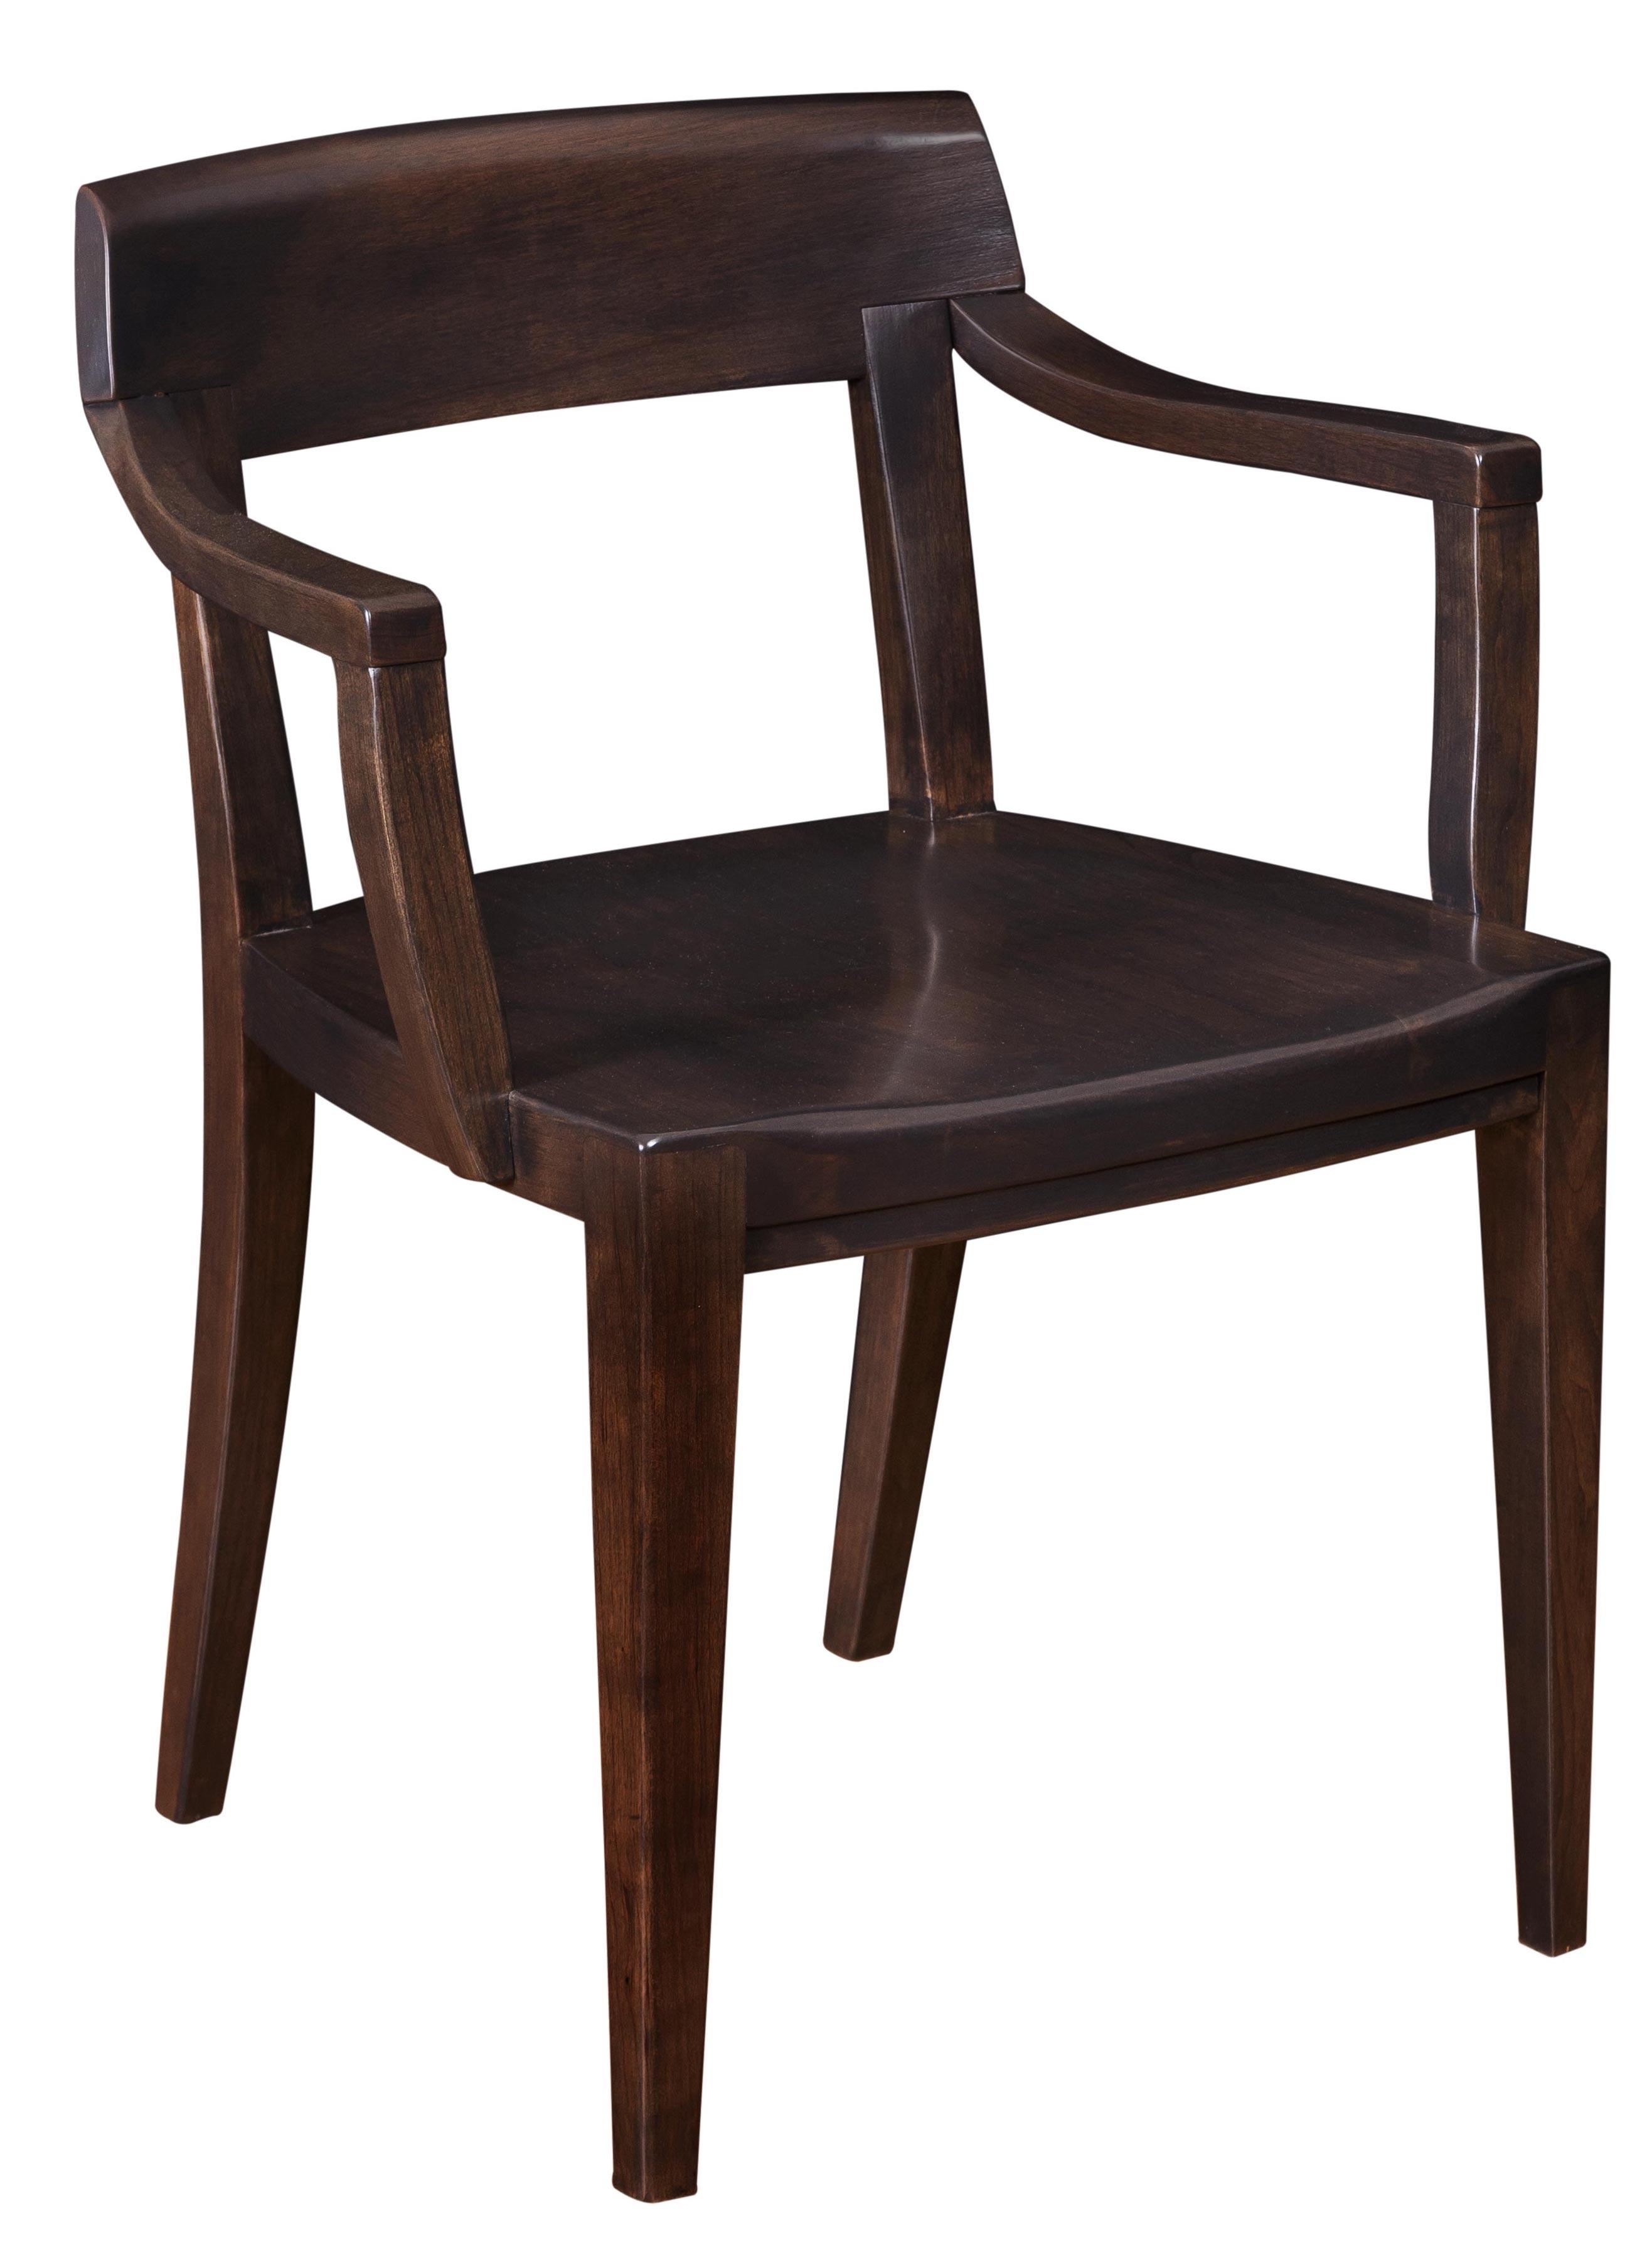 Designer Chesapeake Armchair Image